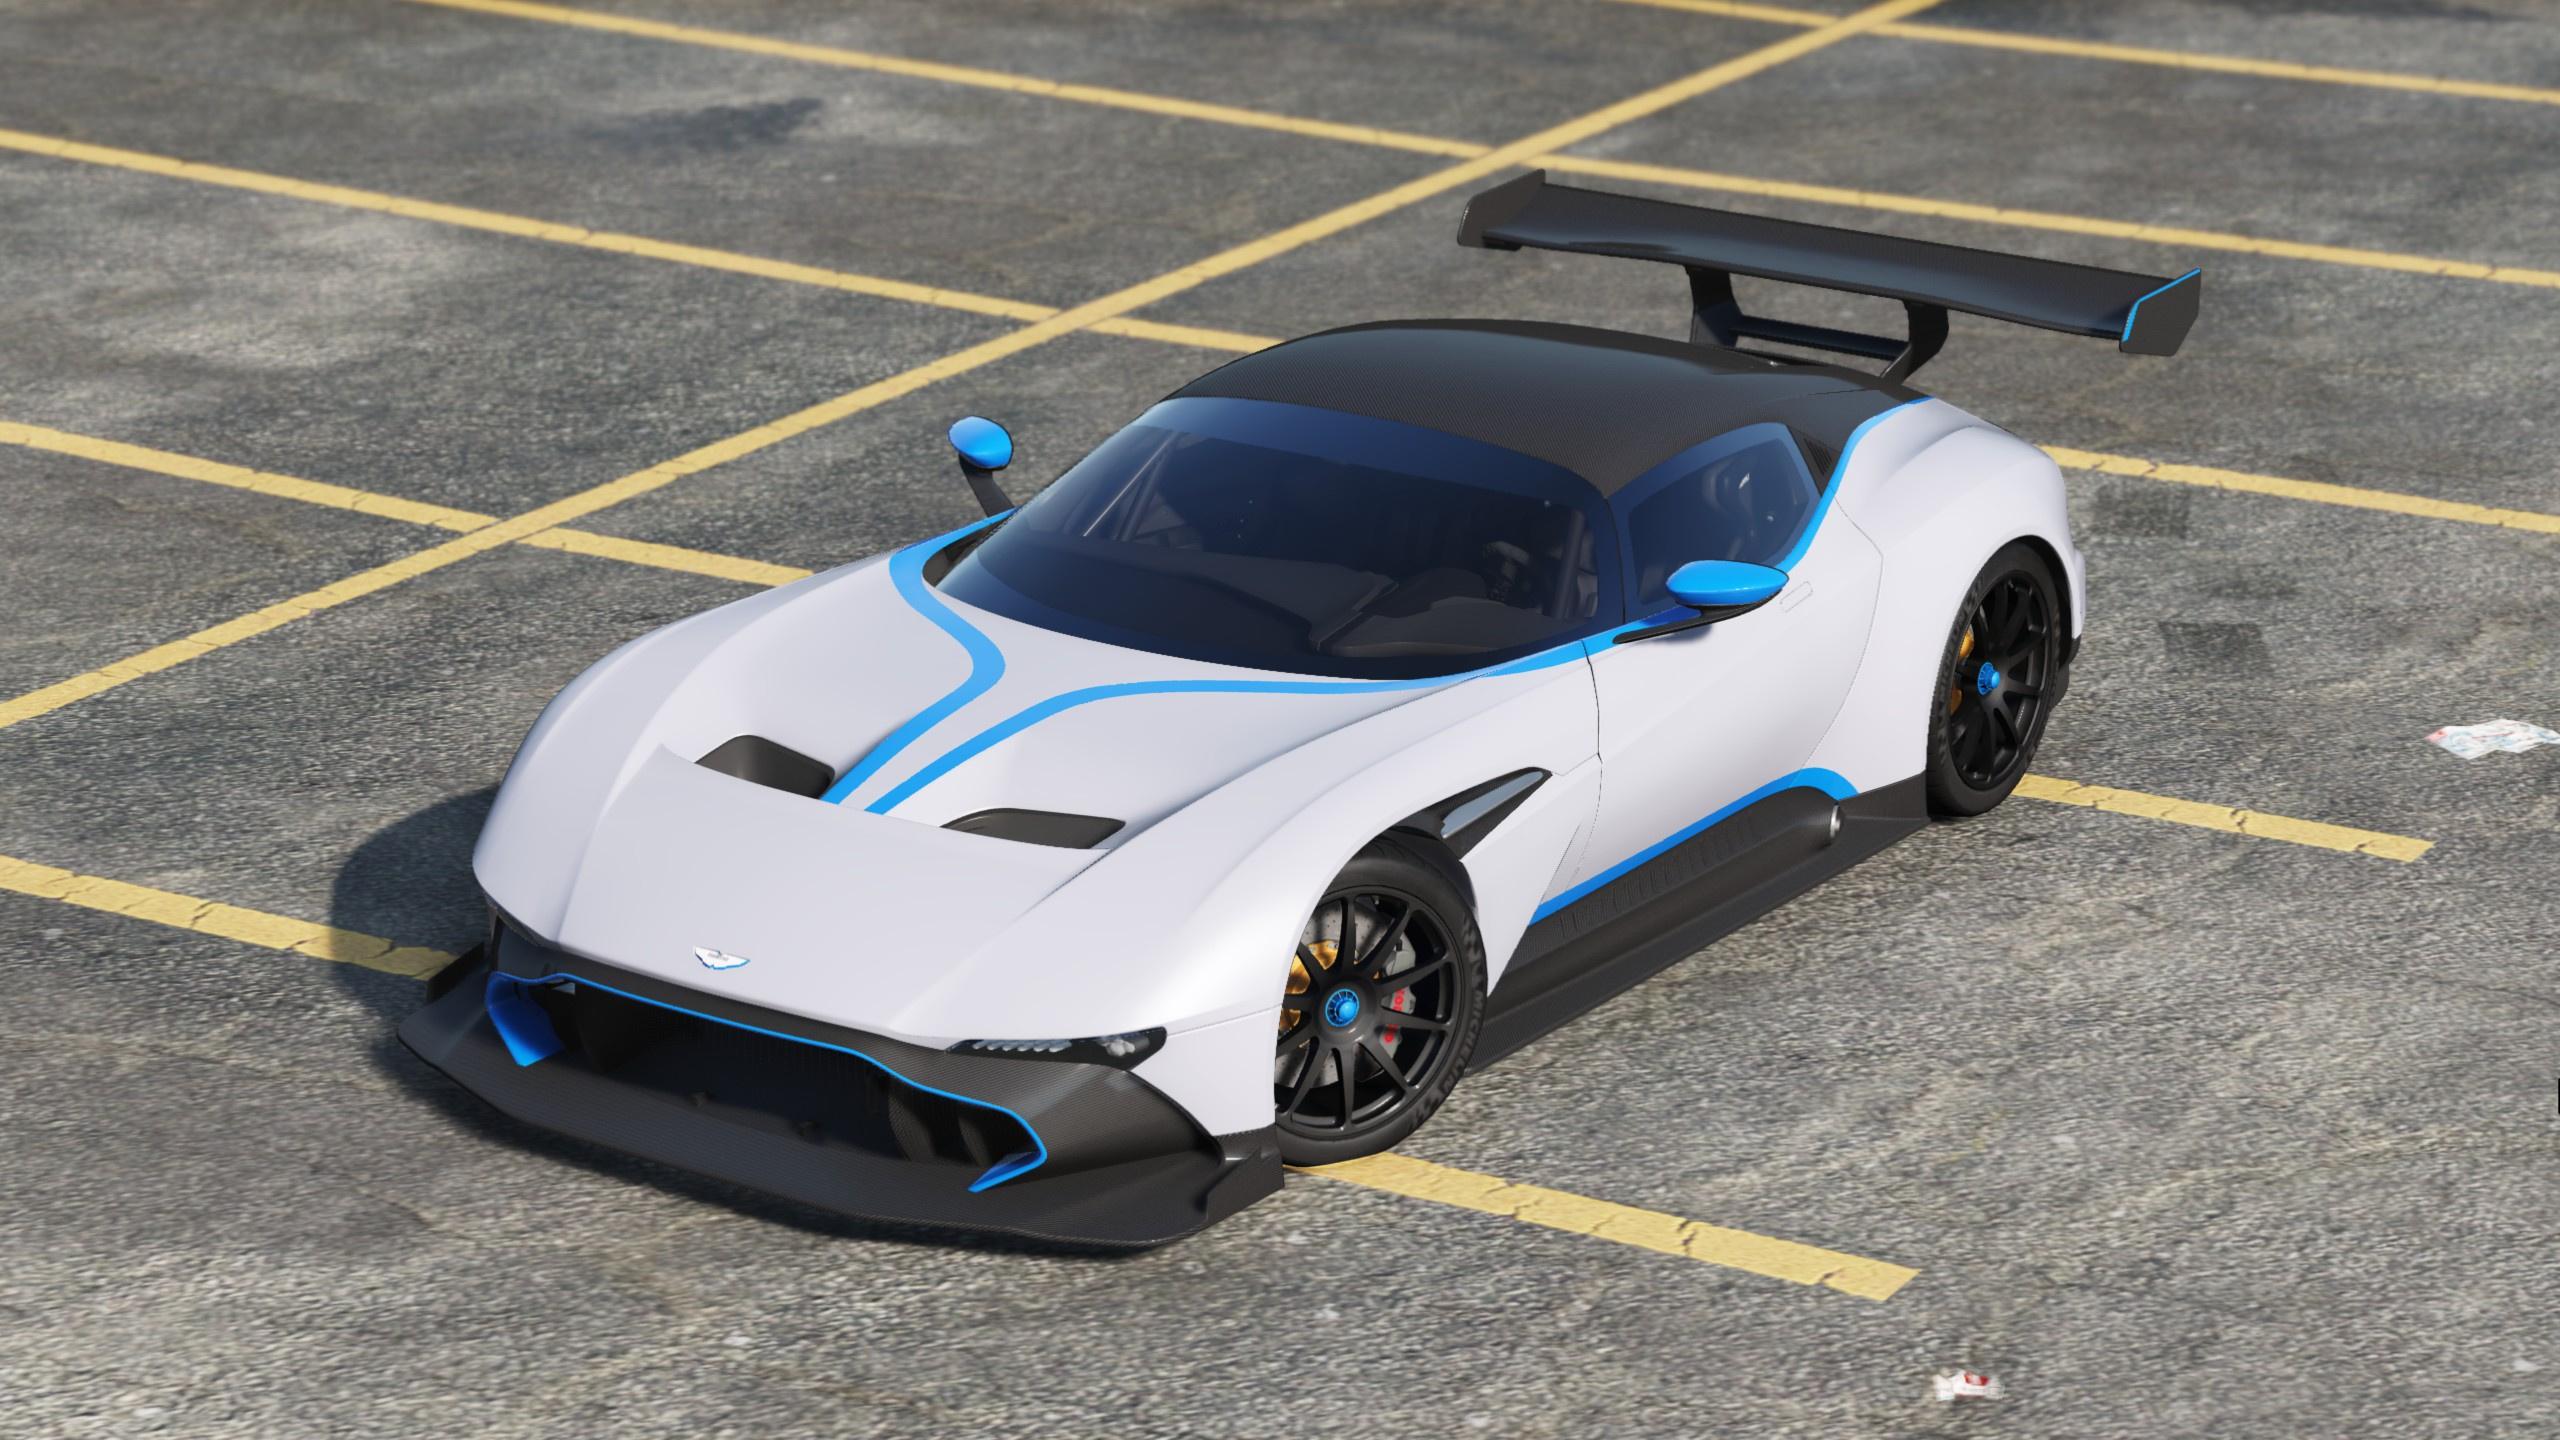 2016 Aston Martin Vulcan Add On Template Gta5 Mods Com